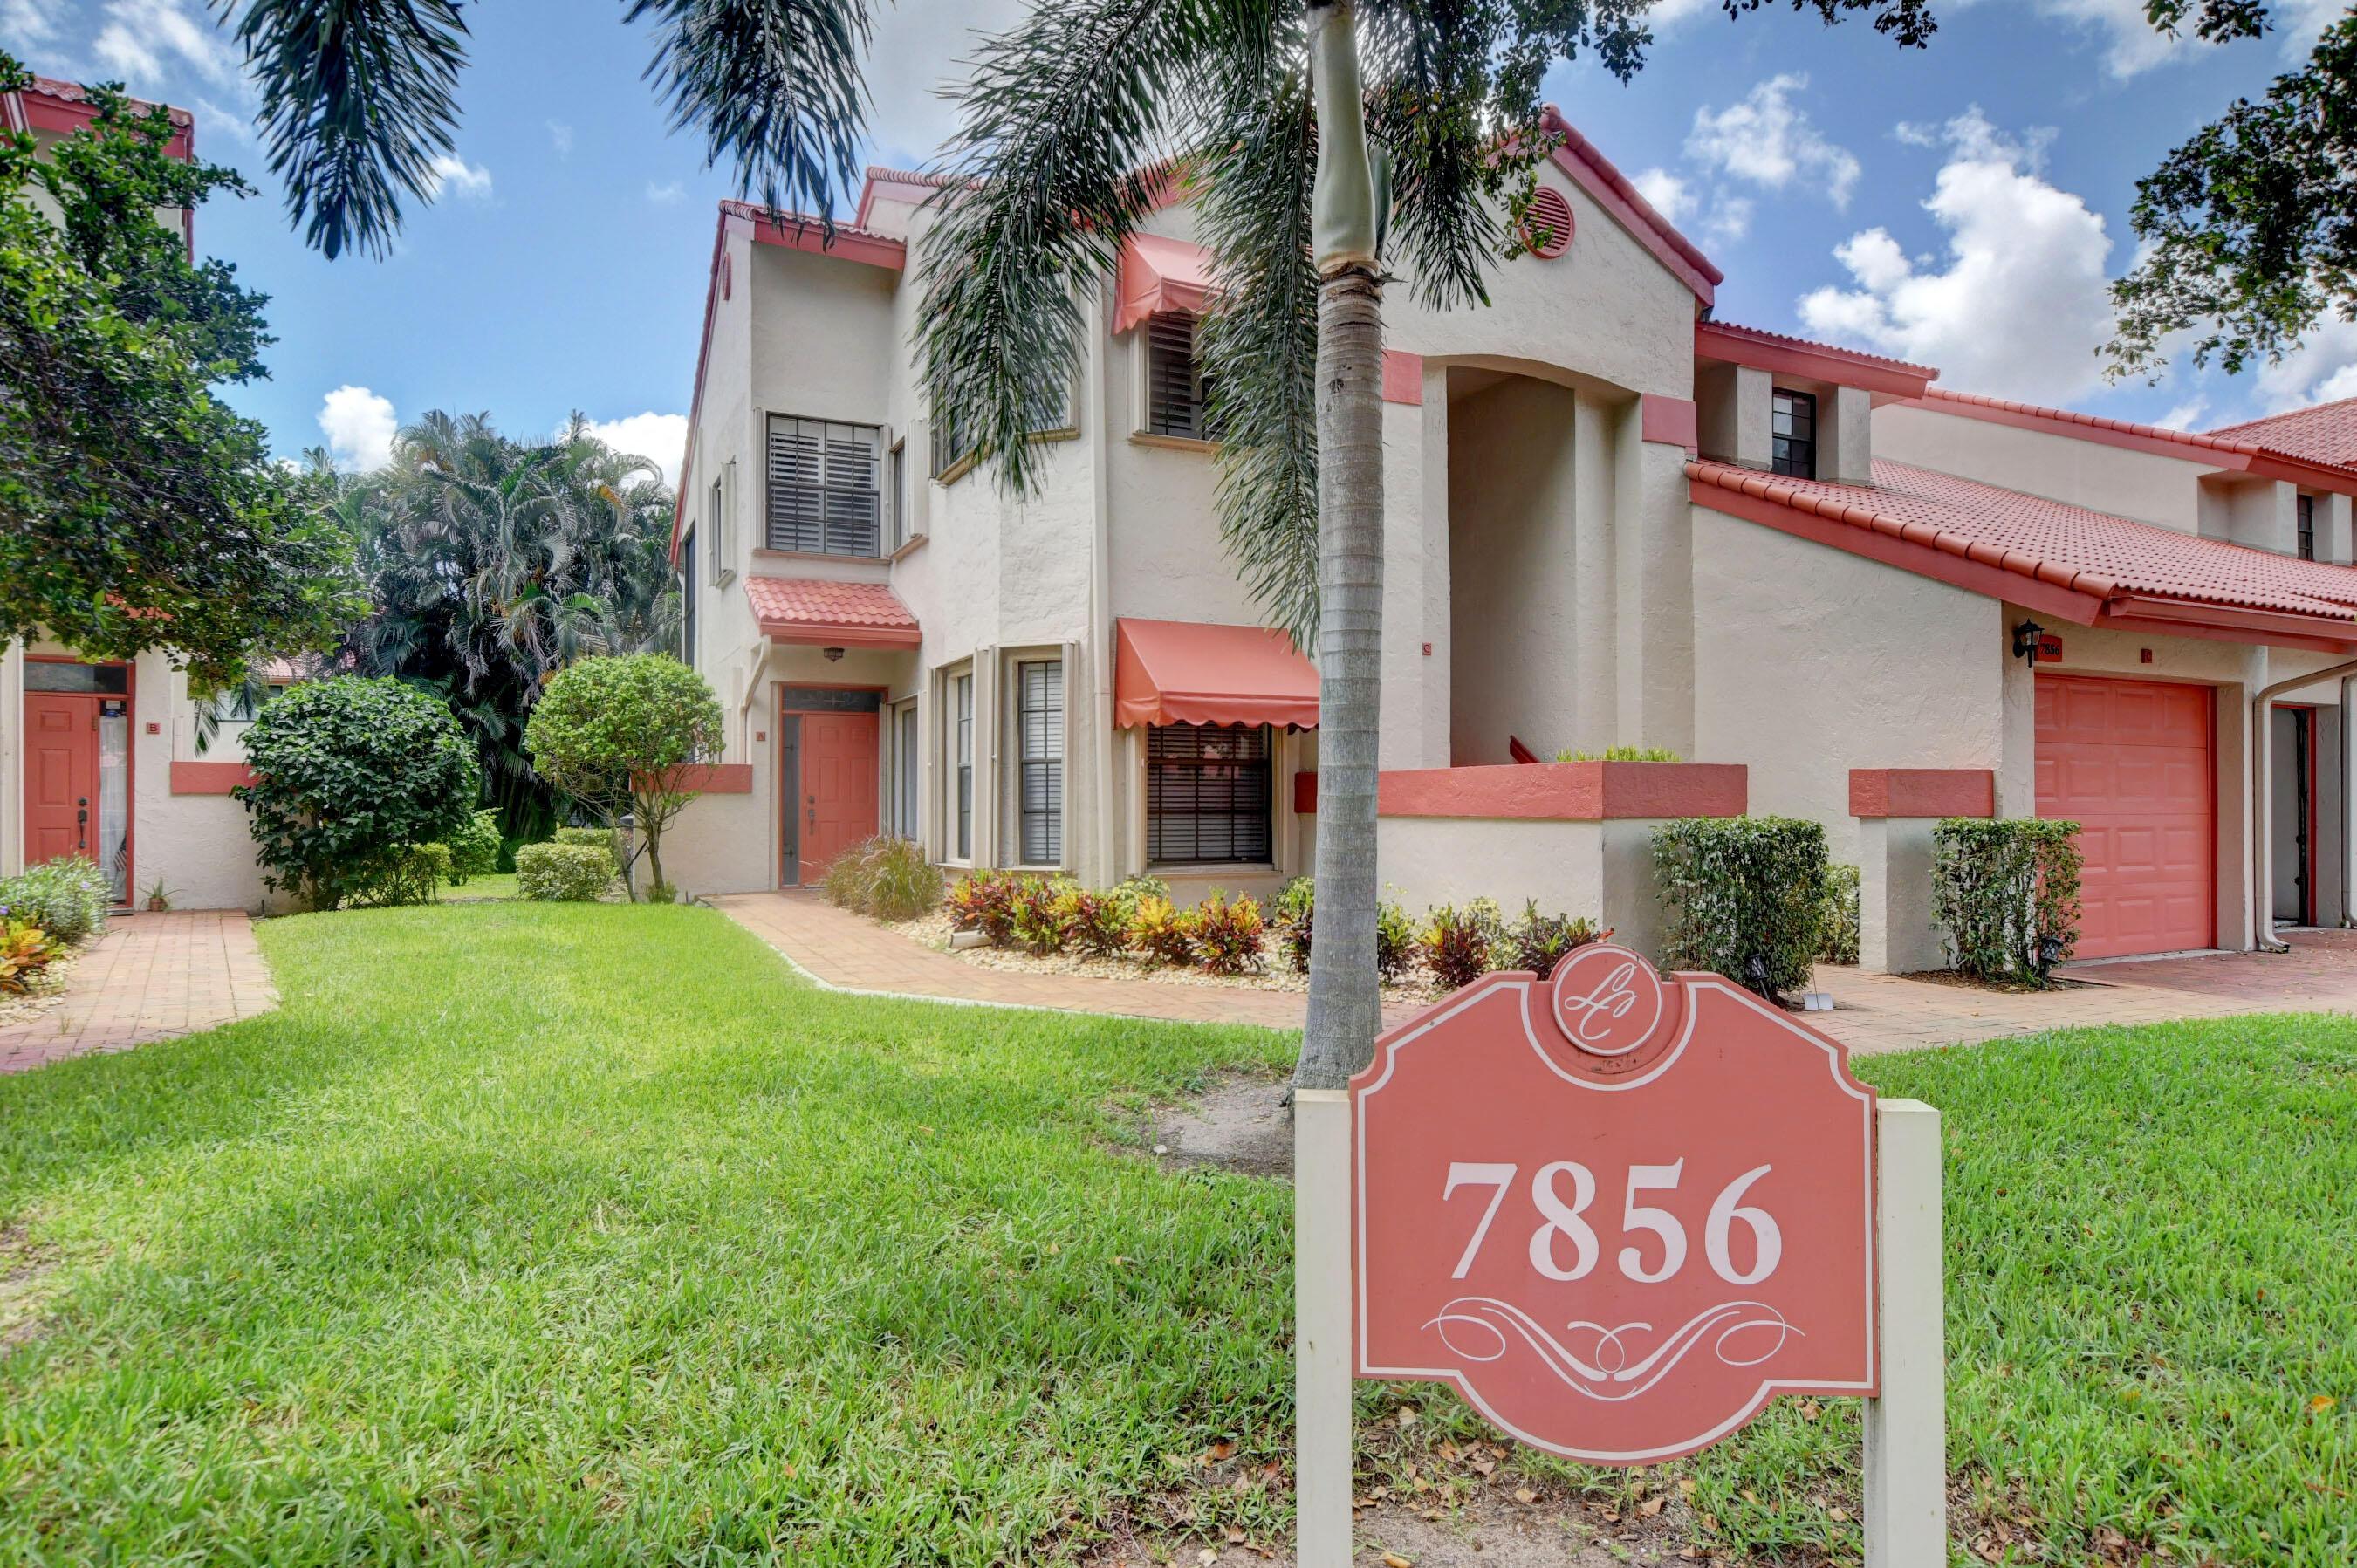 7856  Lexington Club Boulevard A For Sale 10739740, FL